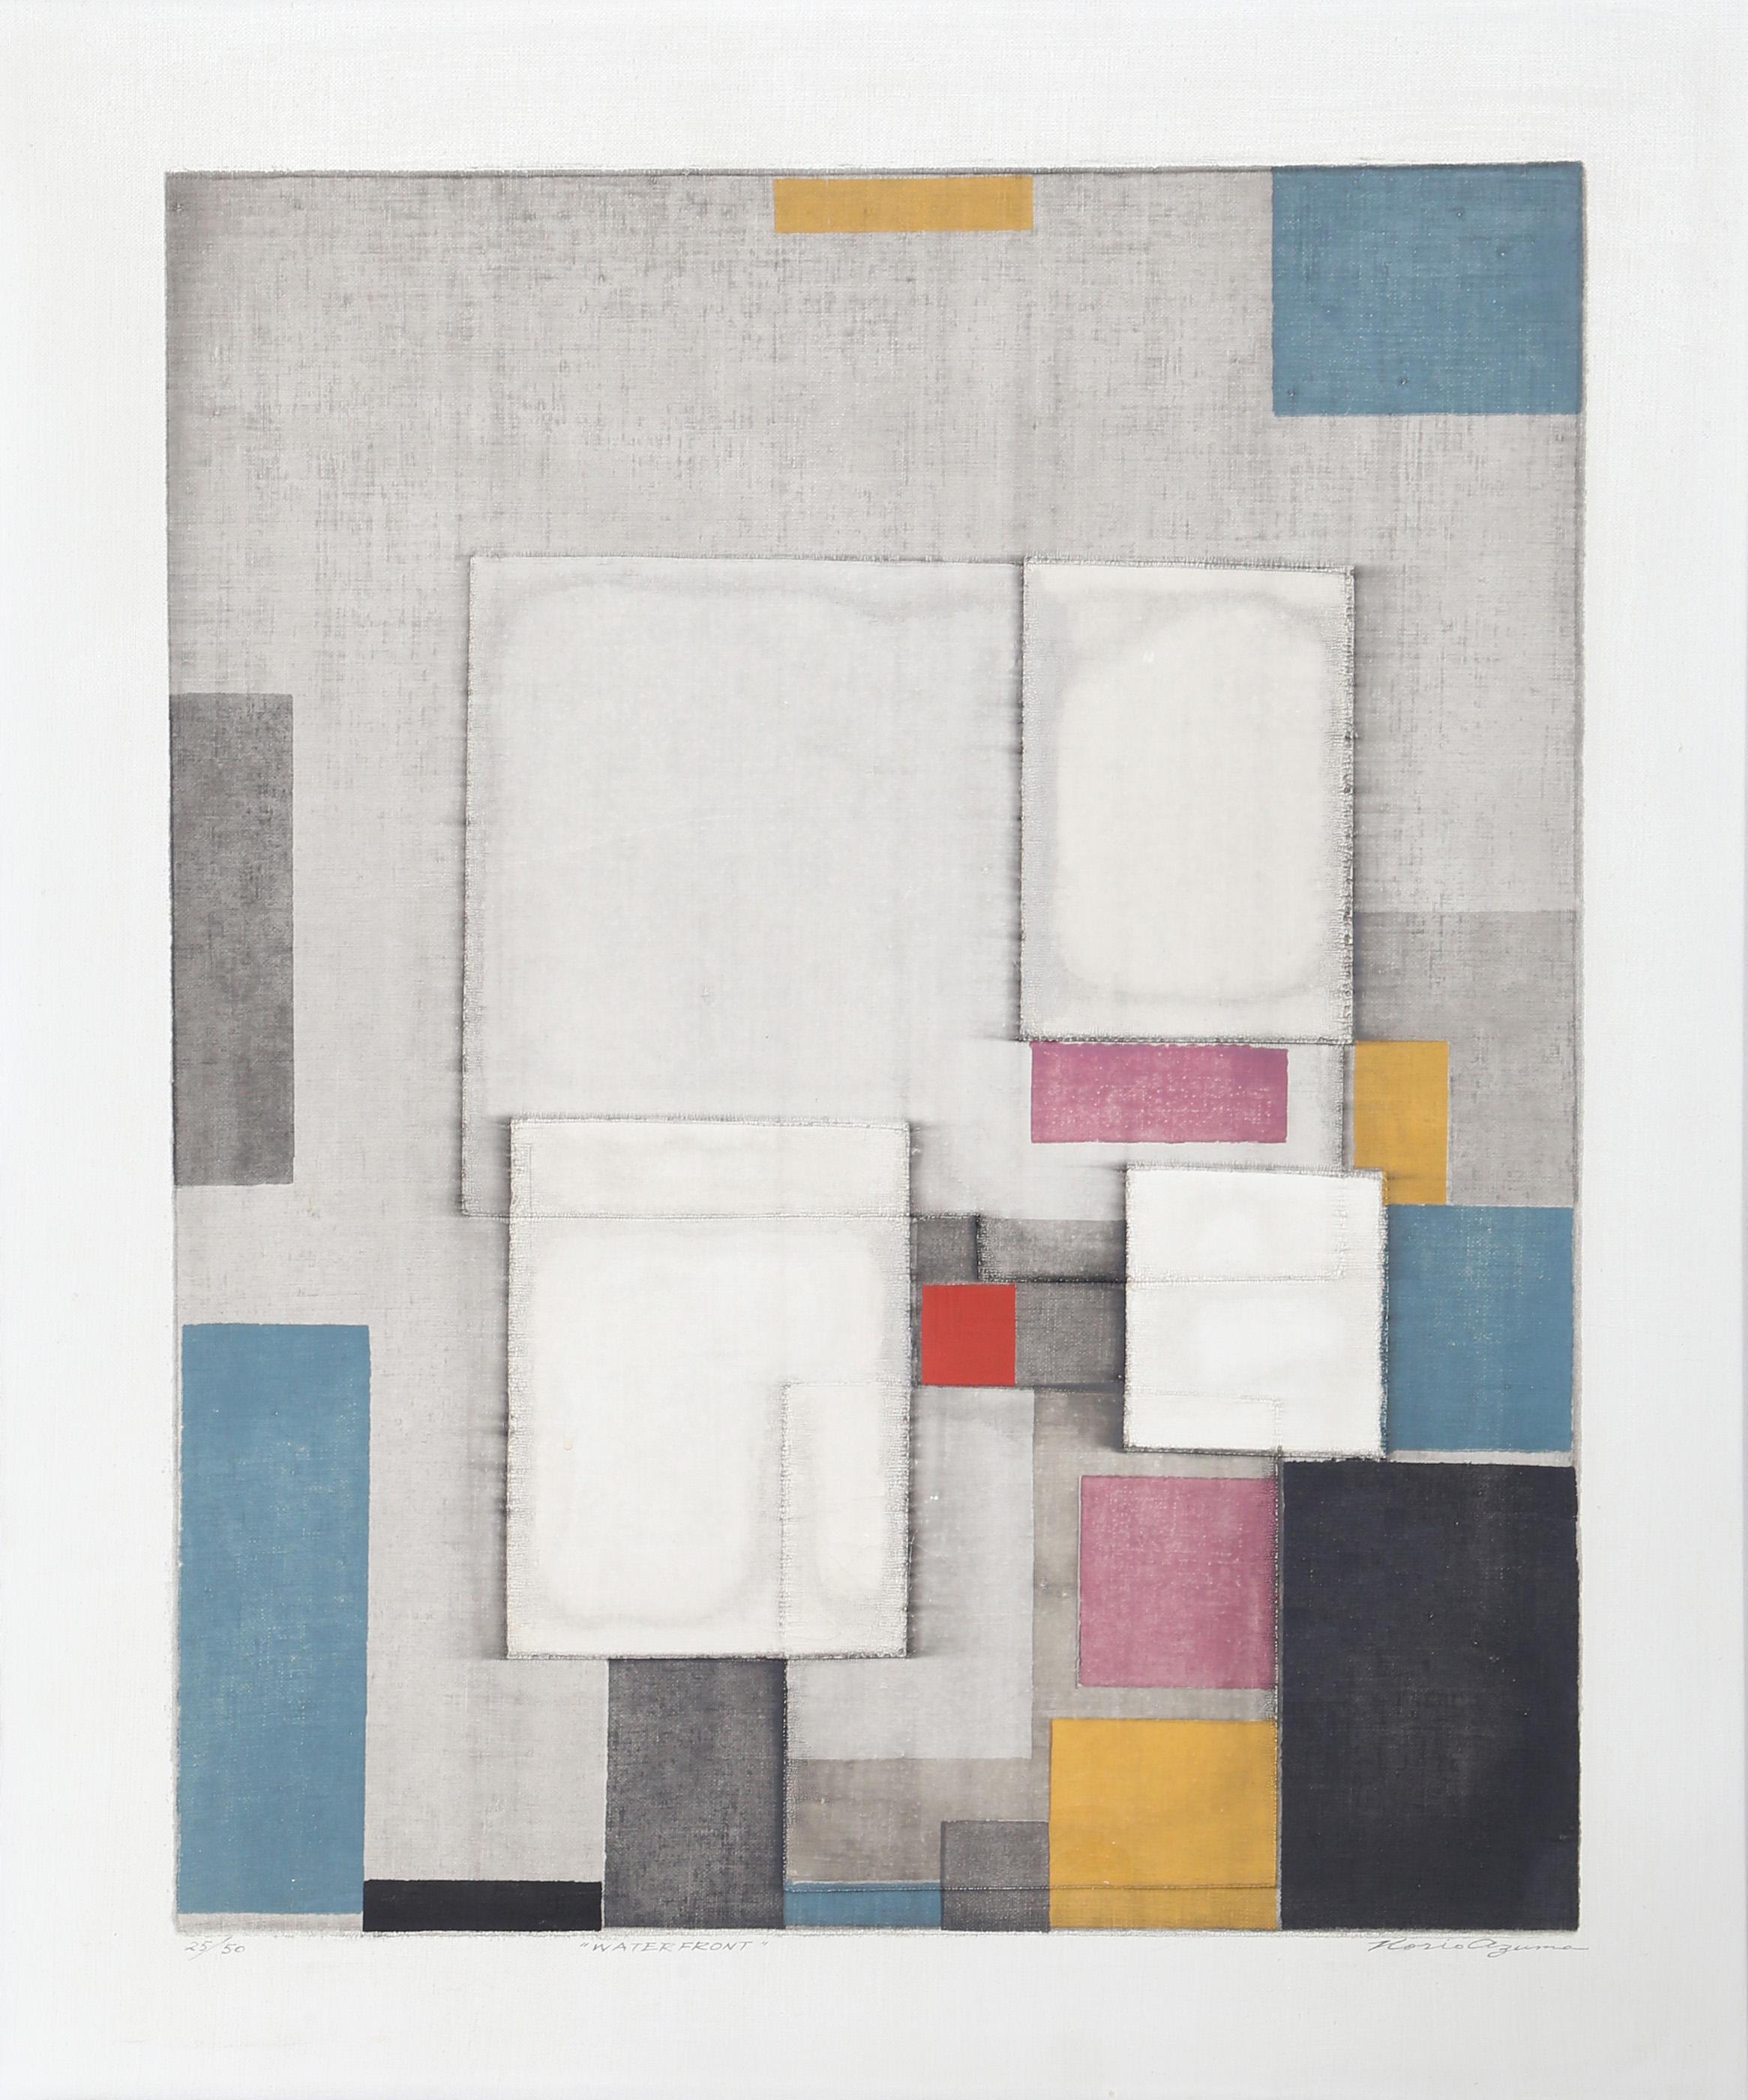 Norio Azuma, Waterfront, Screenprint on canvas